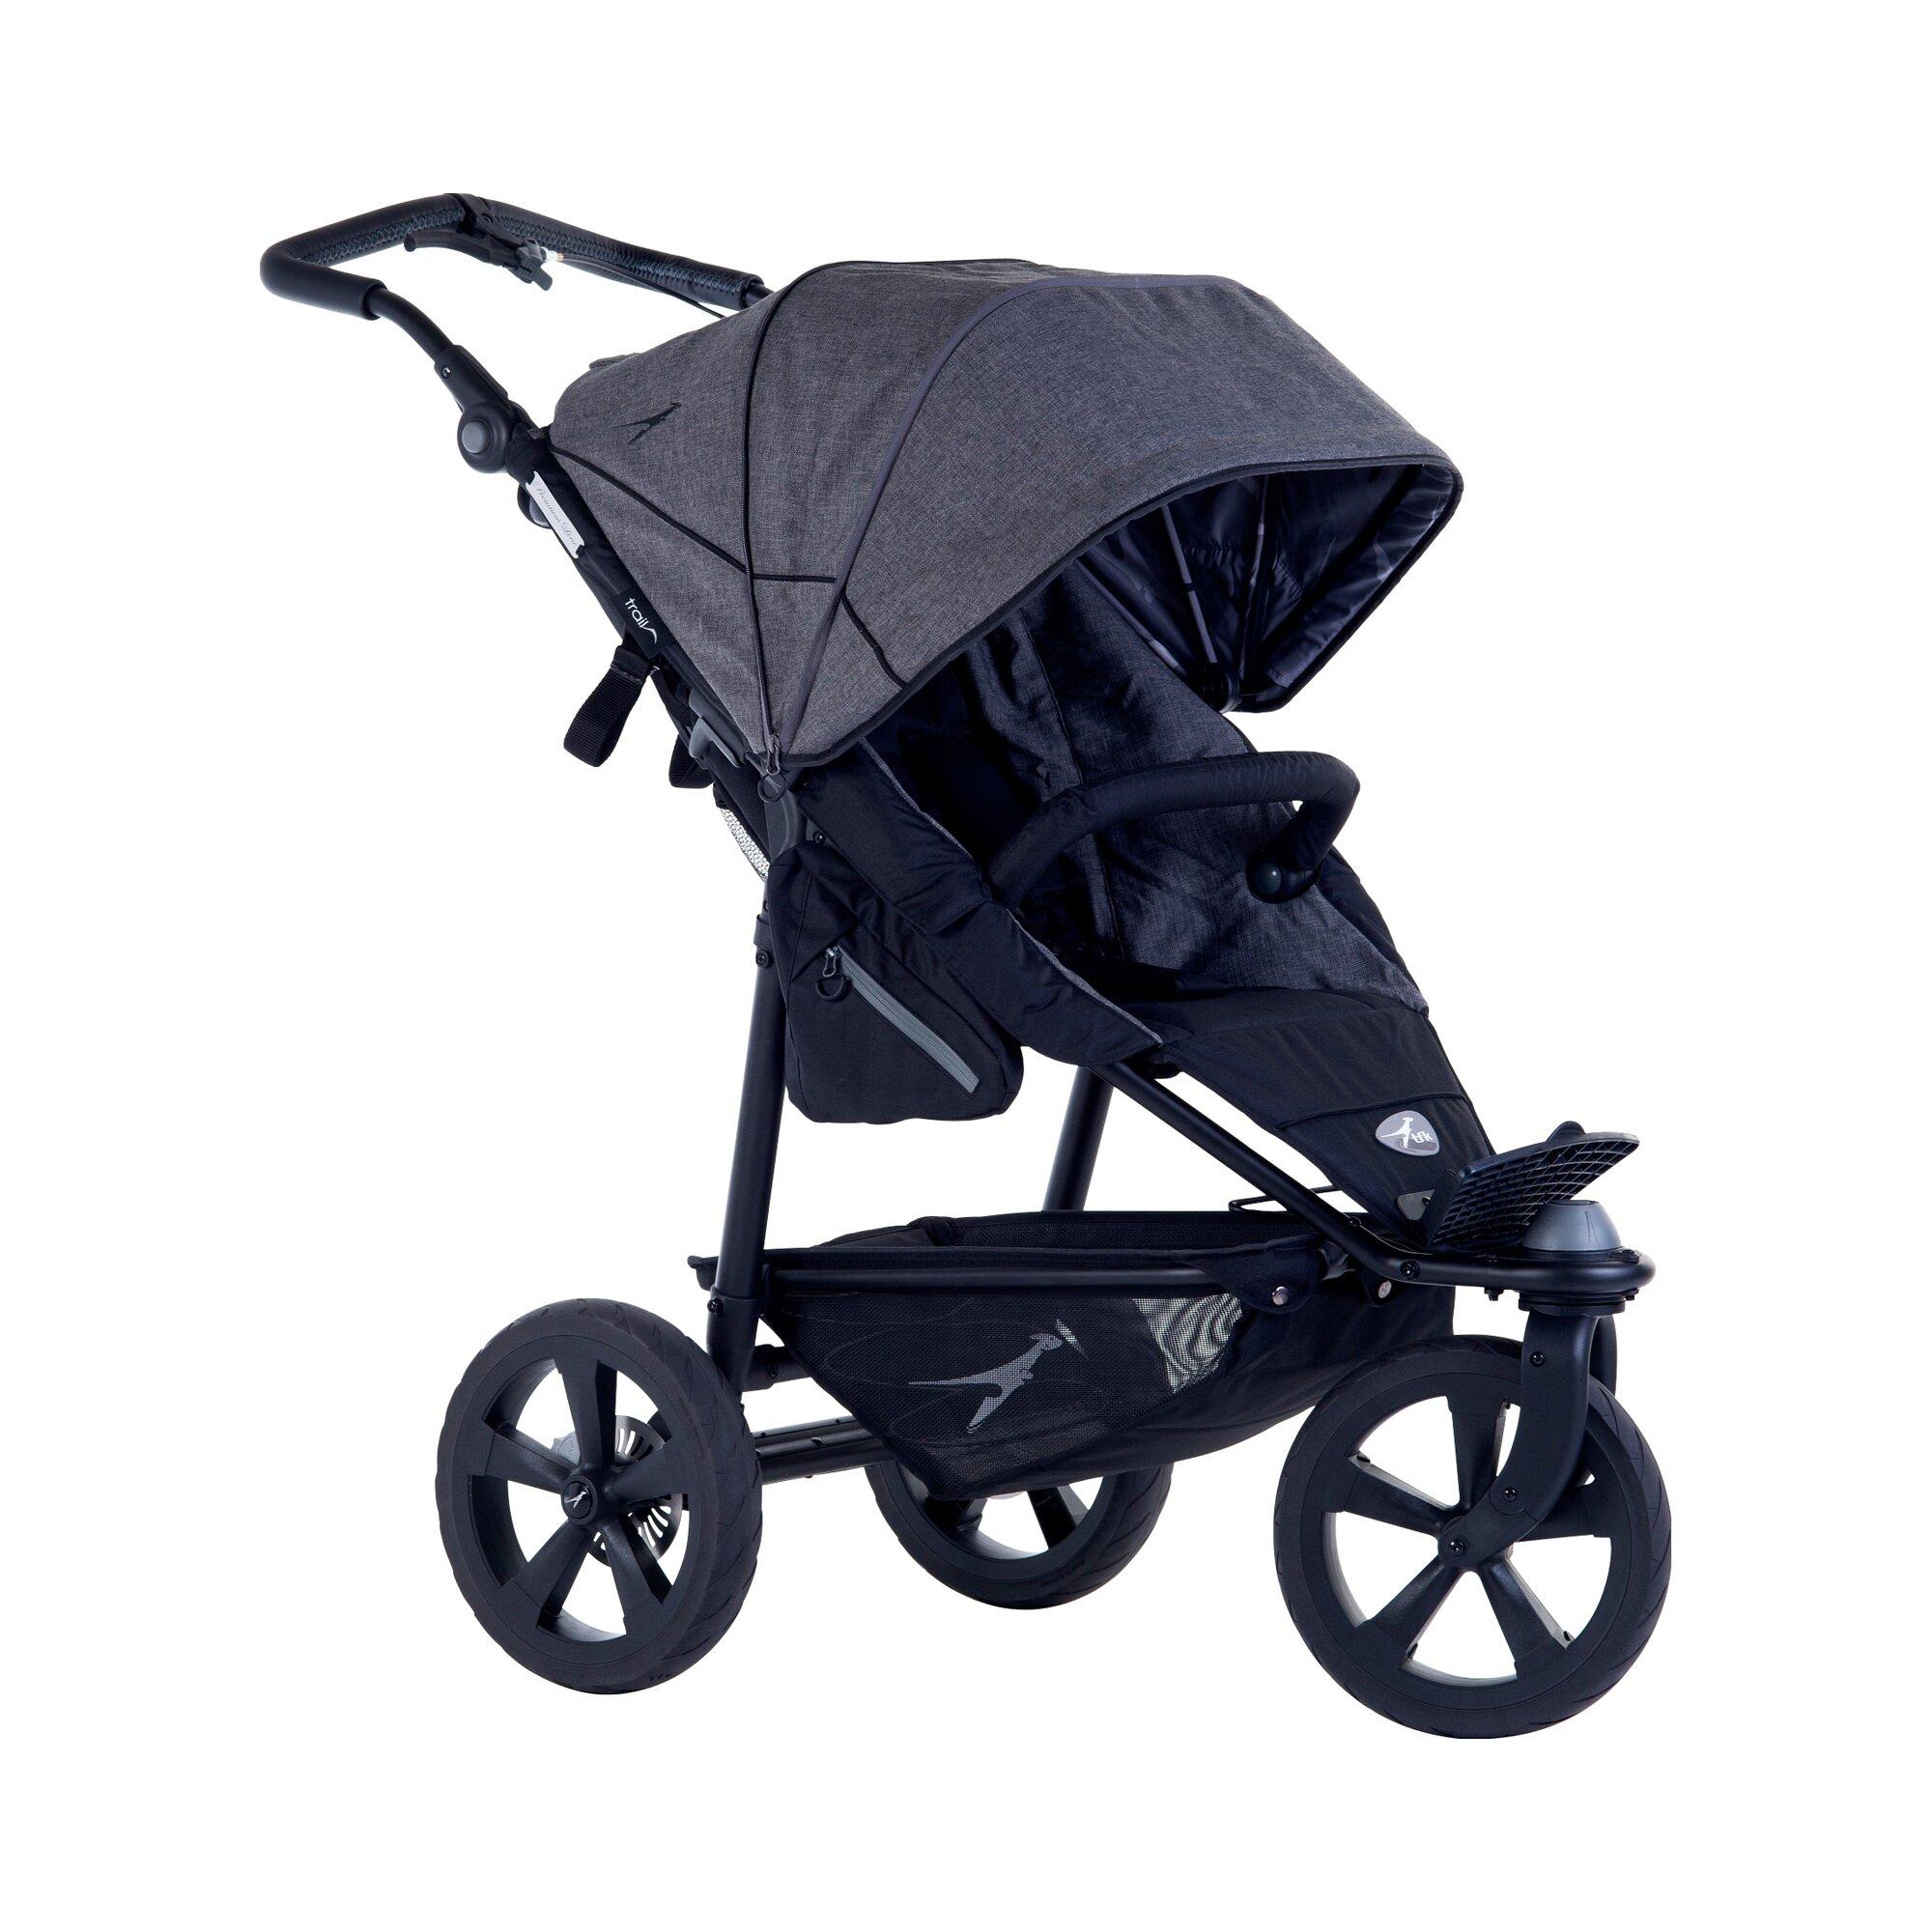 tfk-joggster-trail-2-premium-kinderwagen-grau